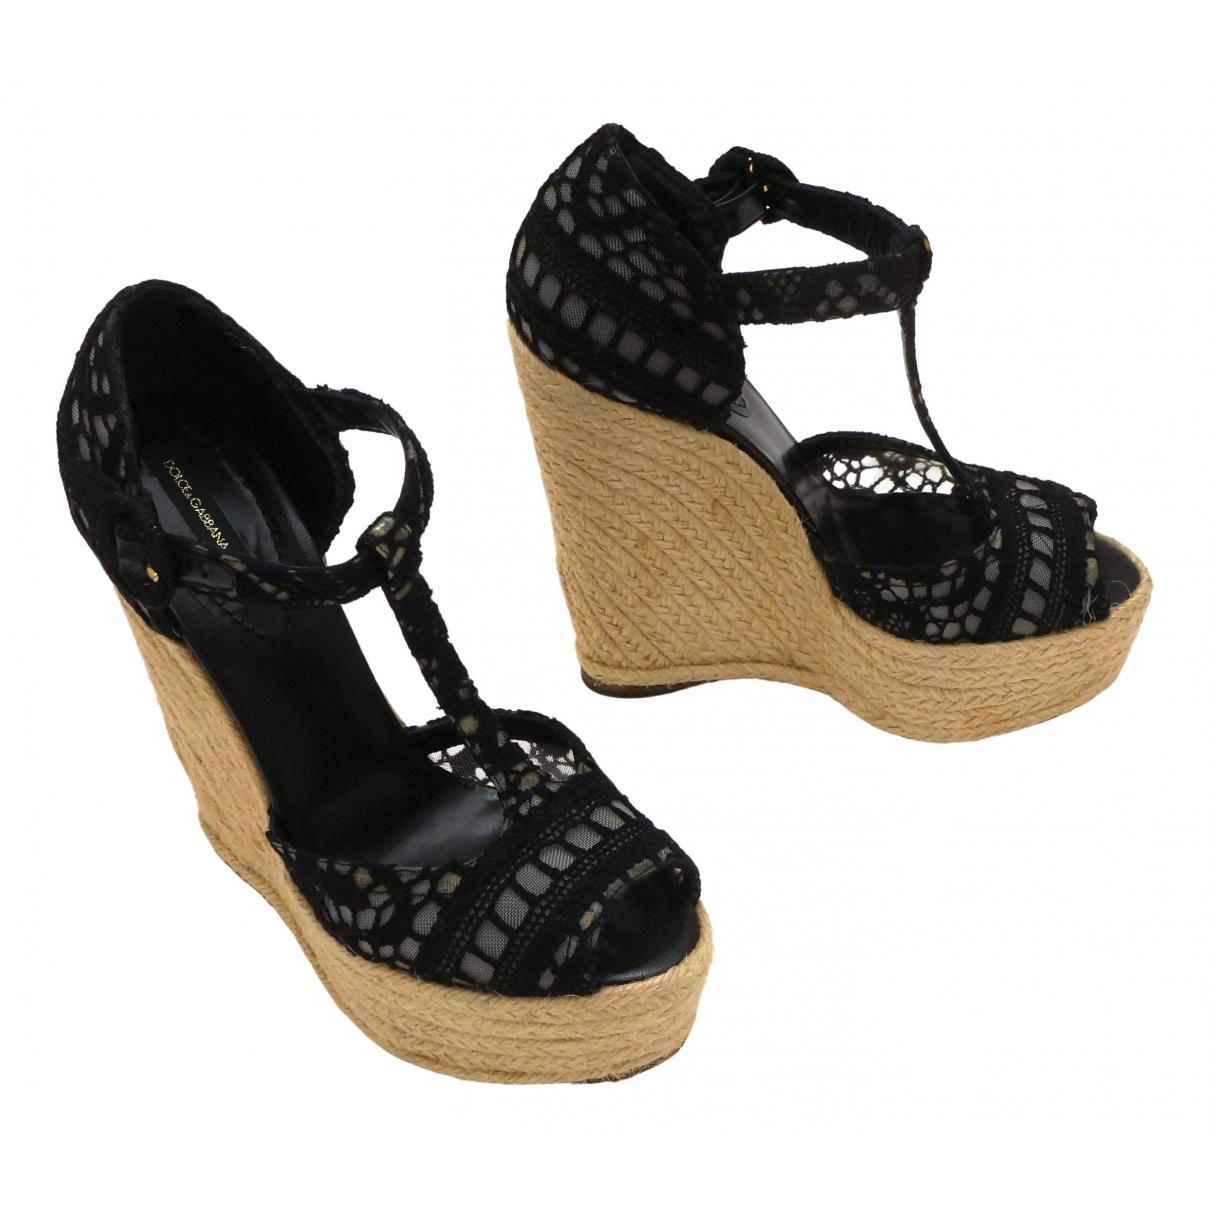 Dolce & Gabbana \N Black Cloth Espadrilles for Women 39 EU